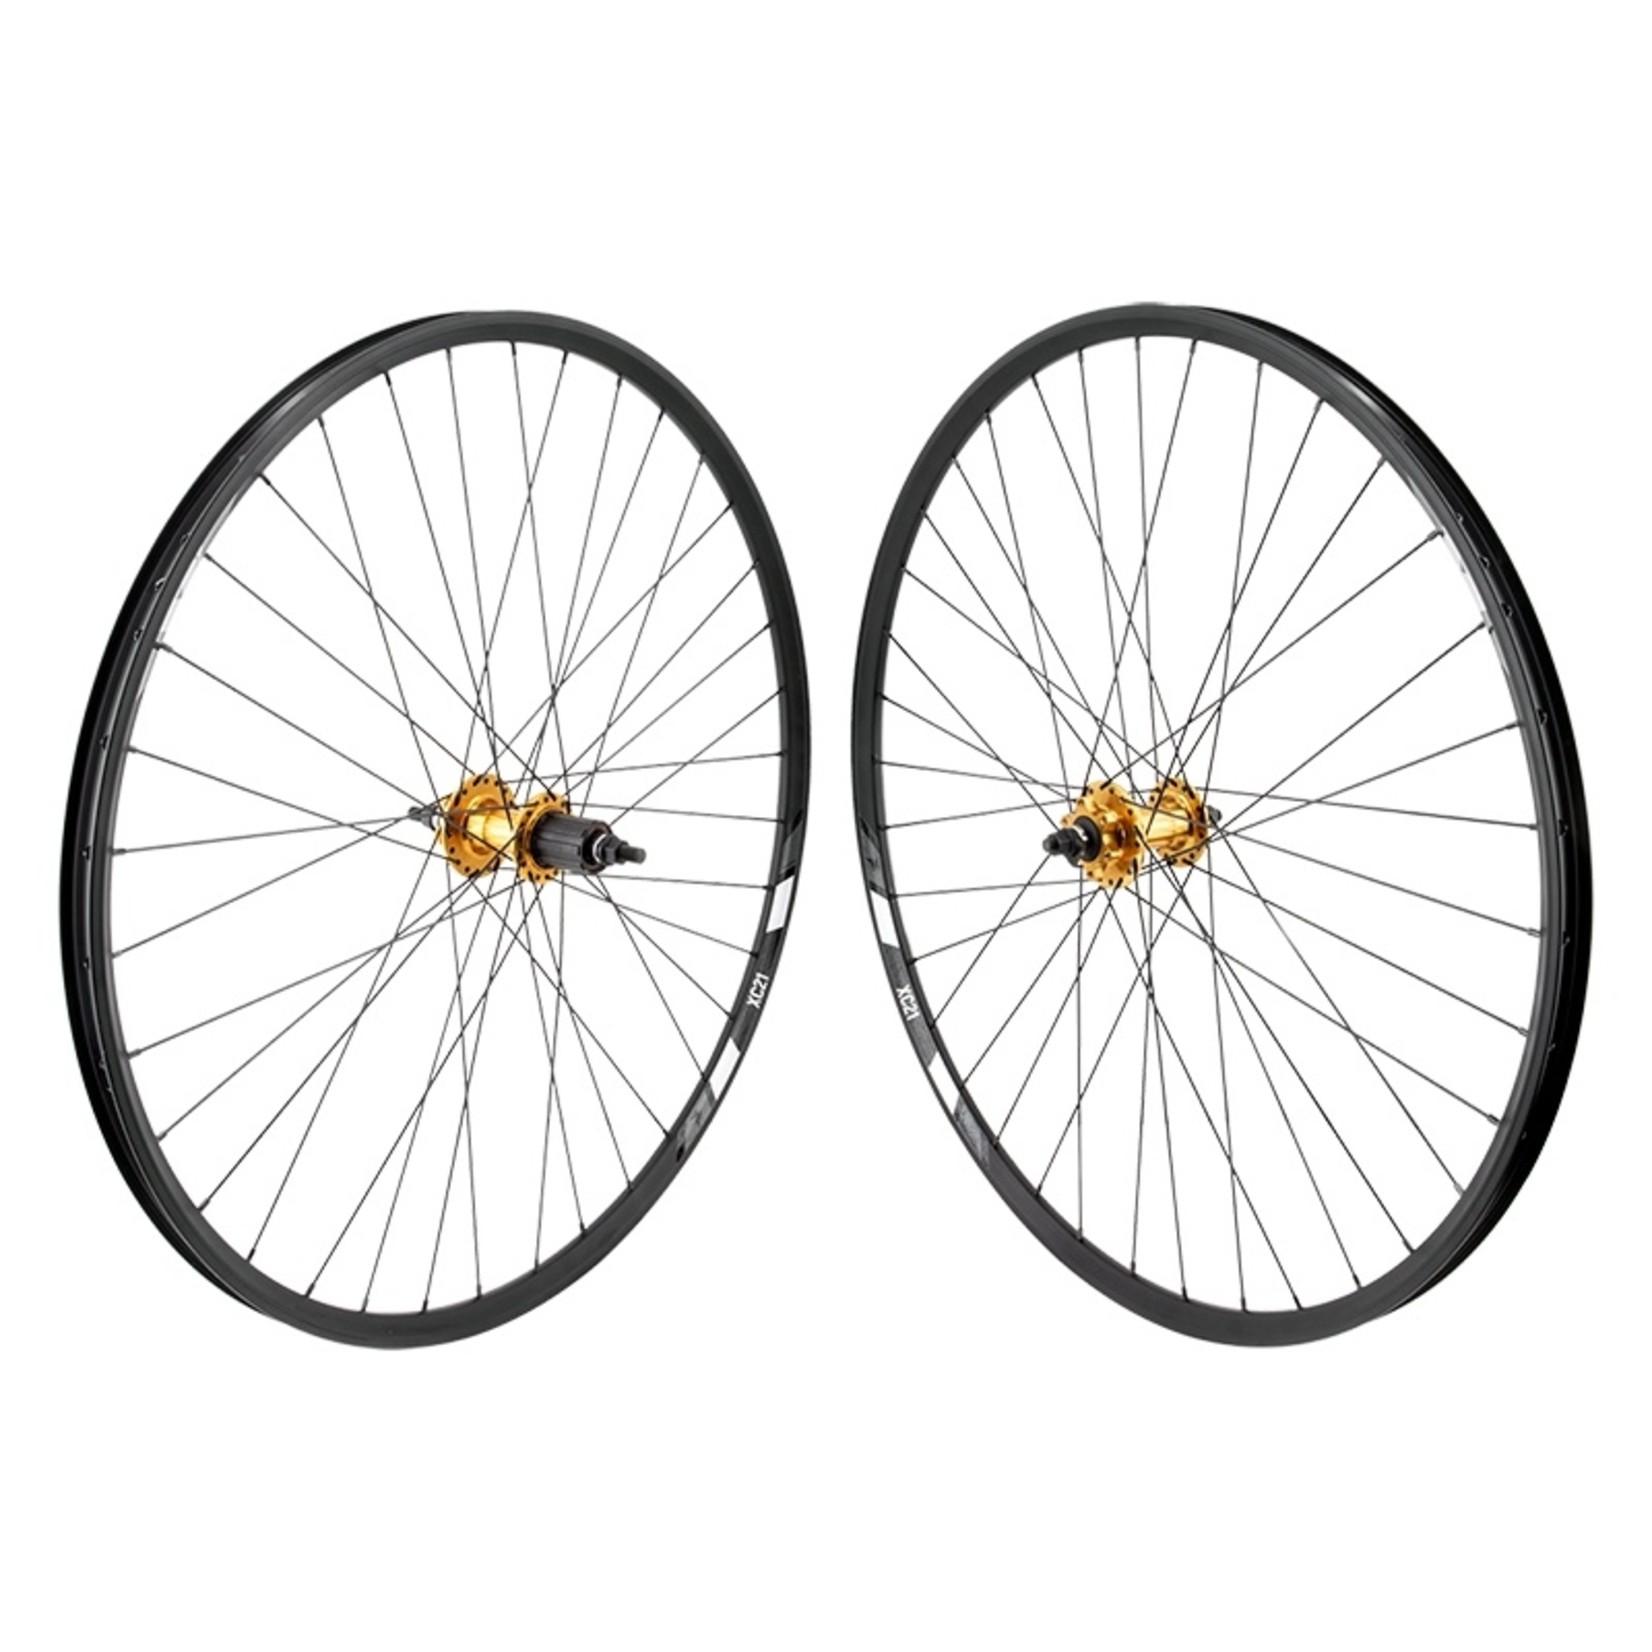 WHEEL MASTER Wheel Pair 29 622x21 WTB XC21 BK Disc 36 ALY 8-10sCAS 6B BO GD 135mm DTI2.0BK Not Tubeless